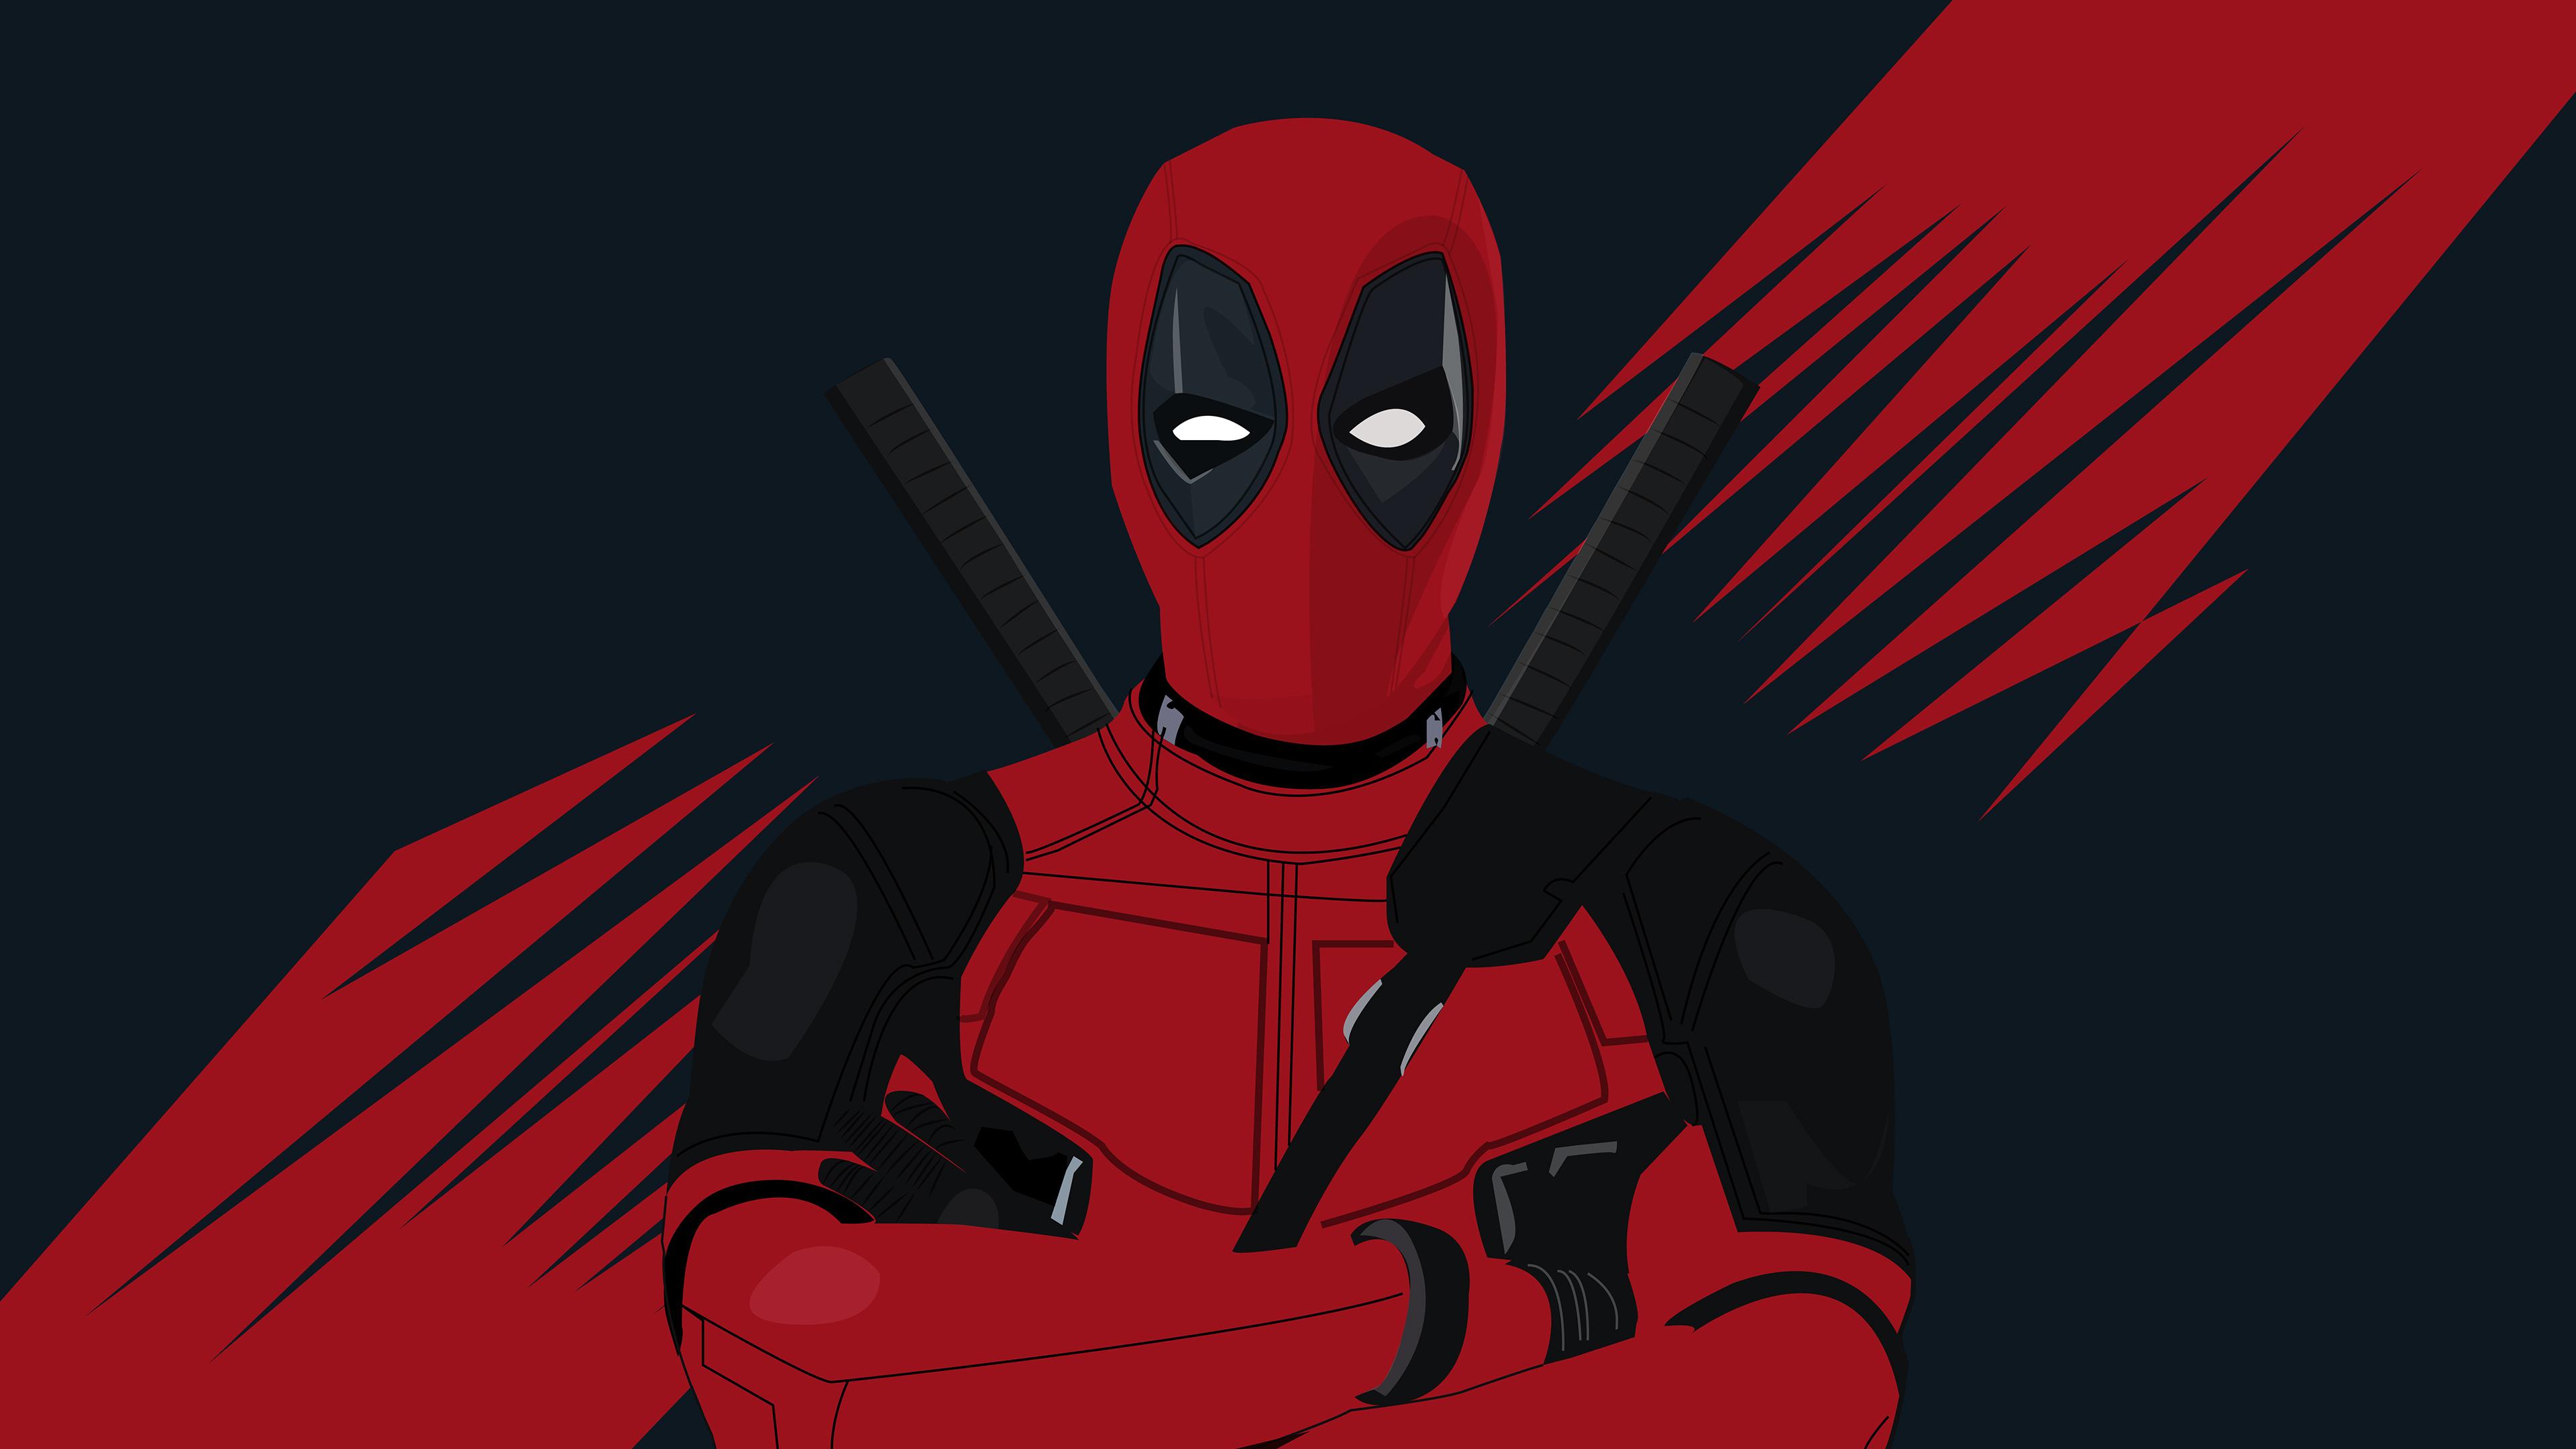 4k deadpool minimal 2019 1553072179 - 4k Deadpool Minimal 2019 - superheroes wallpapers, hd-wallpapers, digital art wallpapers, deadpool wallpapers, behance wallpapers, artwork wallpapers, artist wallpapers, 4k-wallpapers